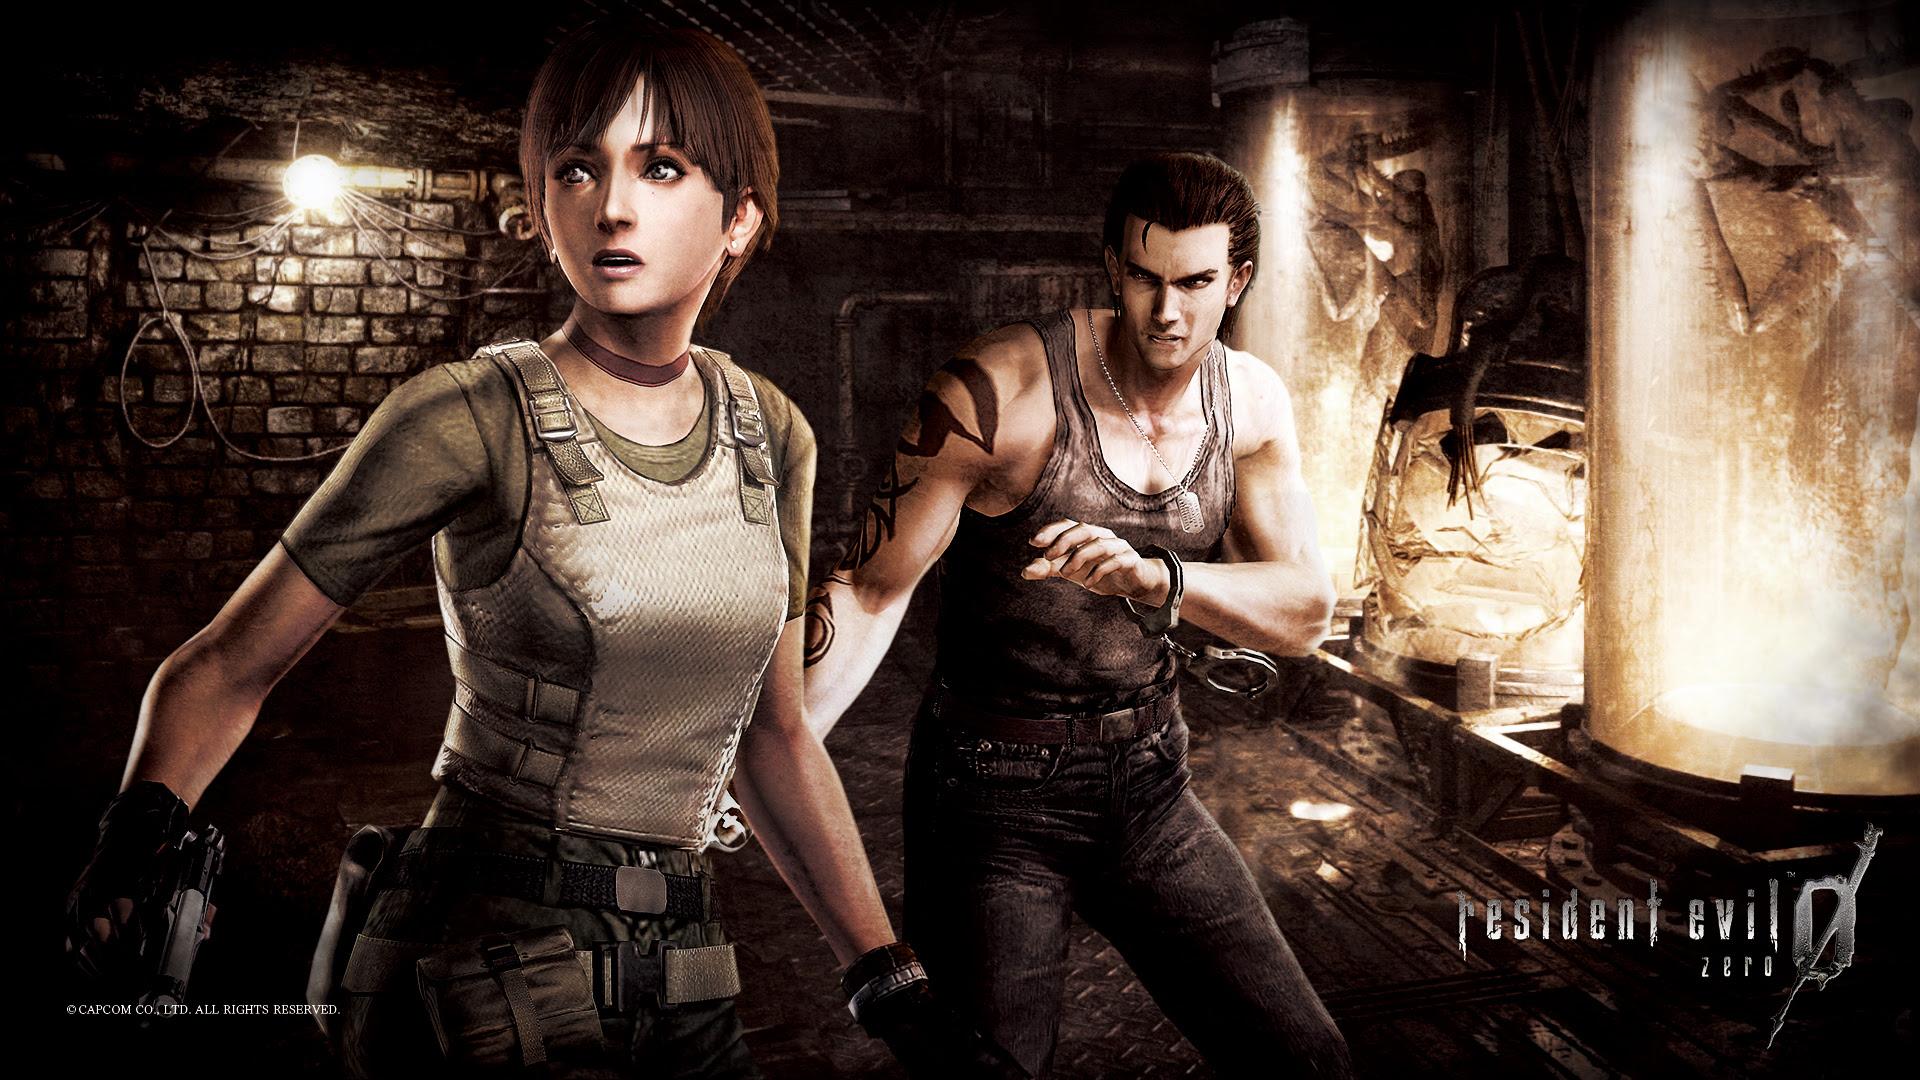 Resident Evil 0 Hd Remaster 壁紙 7 バイオハザード 壁紙 39166818